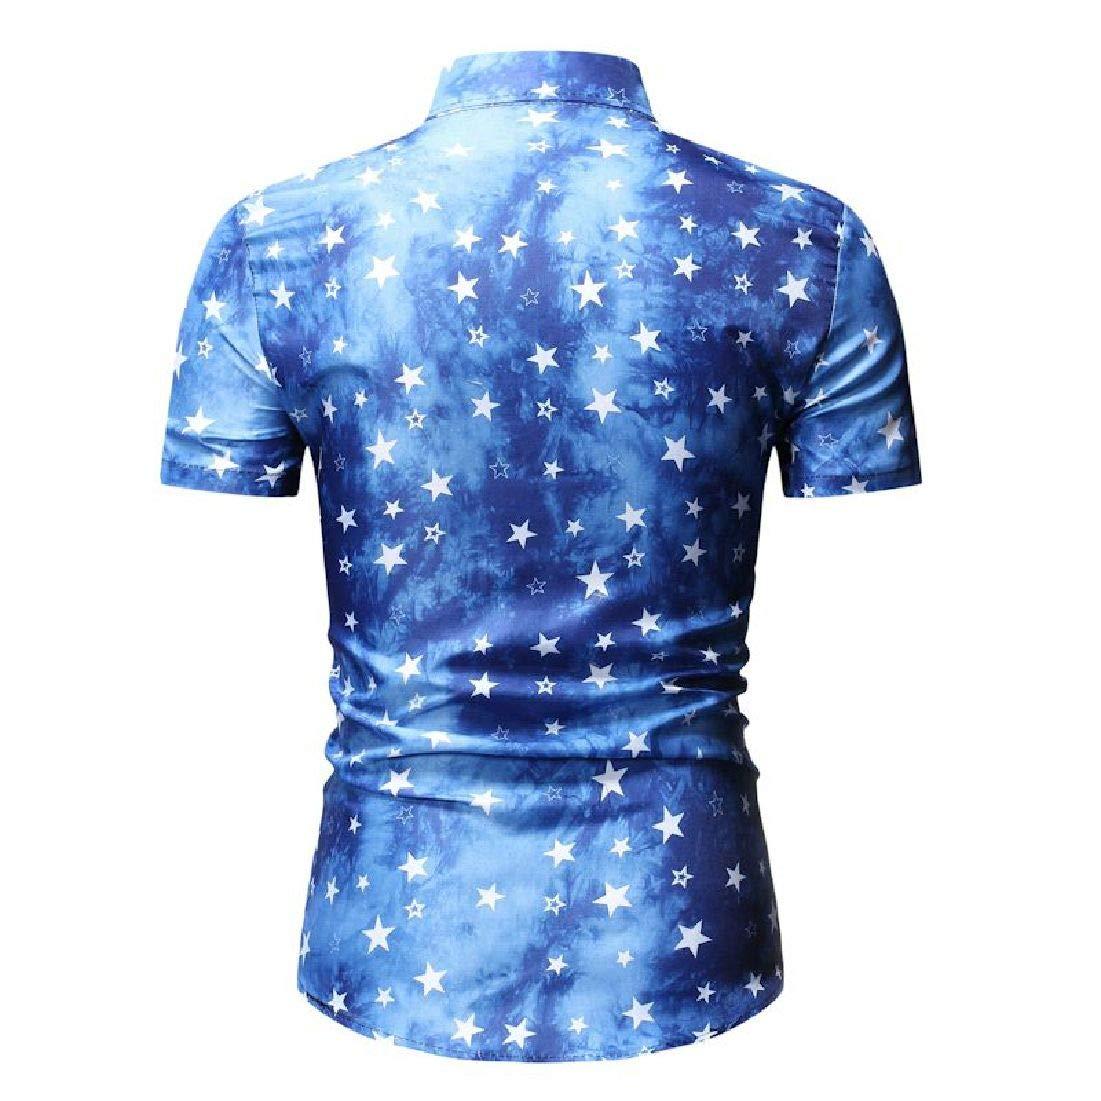 Zantt Men Fashion Short Sleeve Tie-Dyed Slim Fit Stars Pattern Button Down Shirts